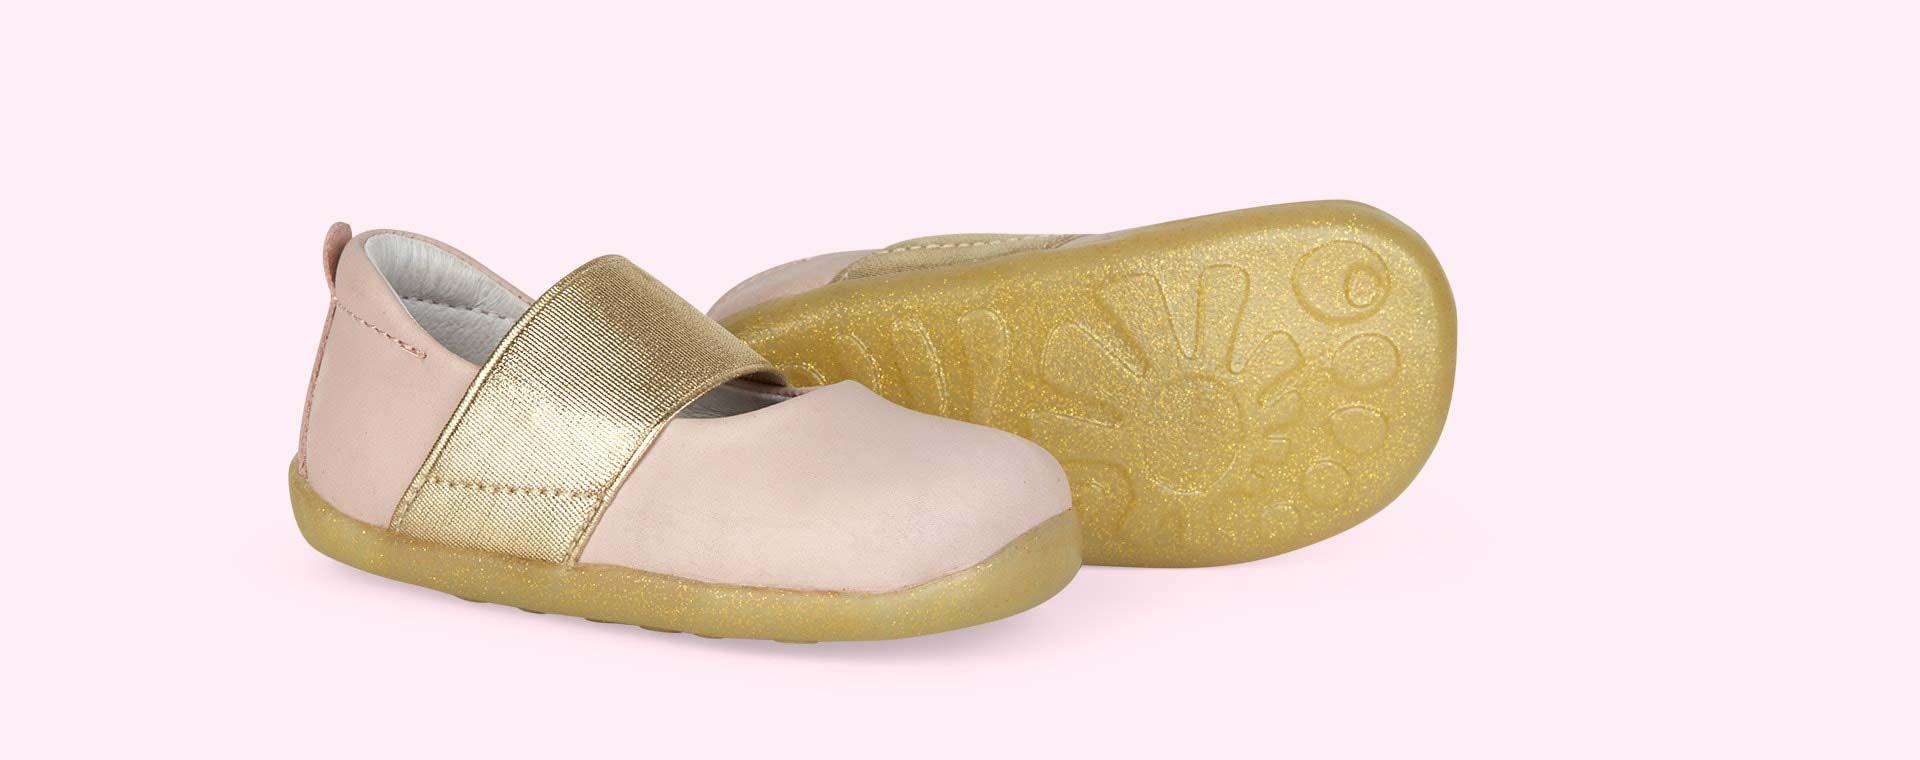 Blush Bobux Step-Up Demi Shoe